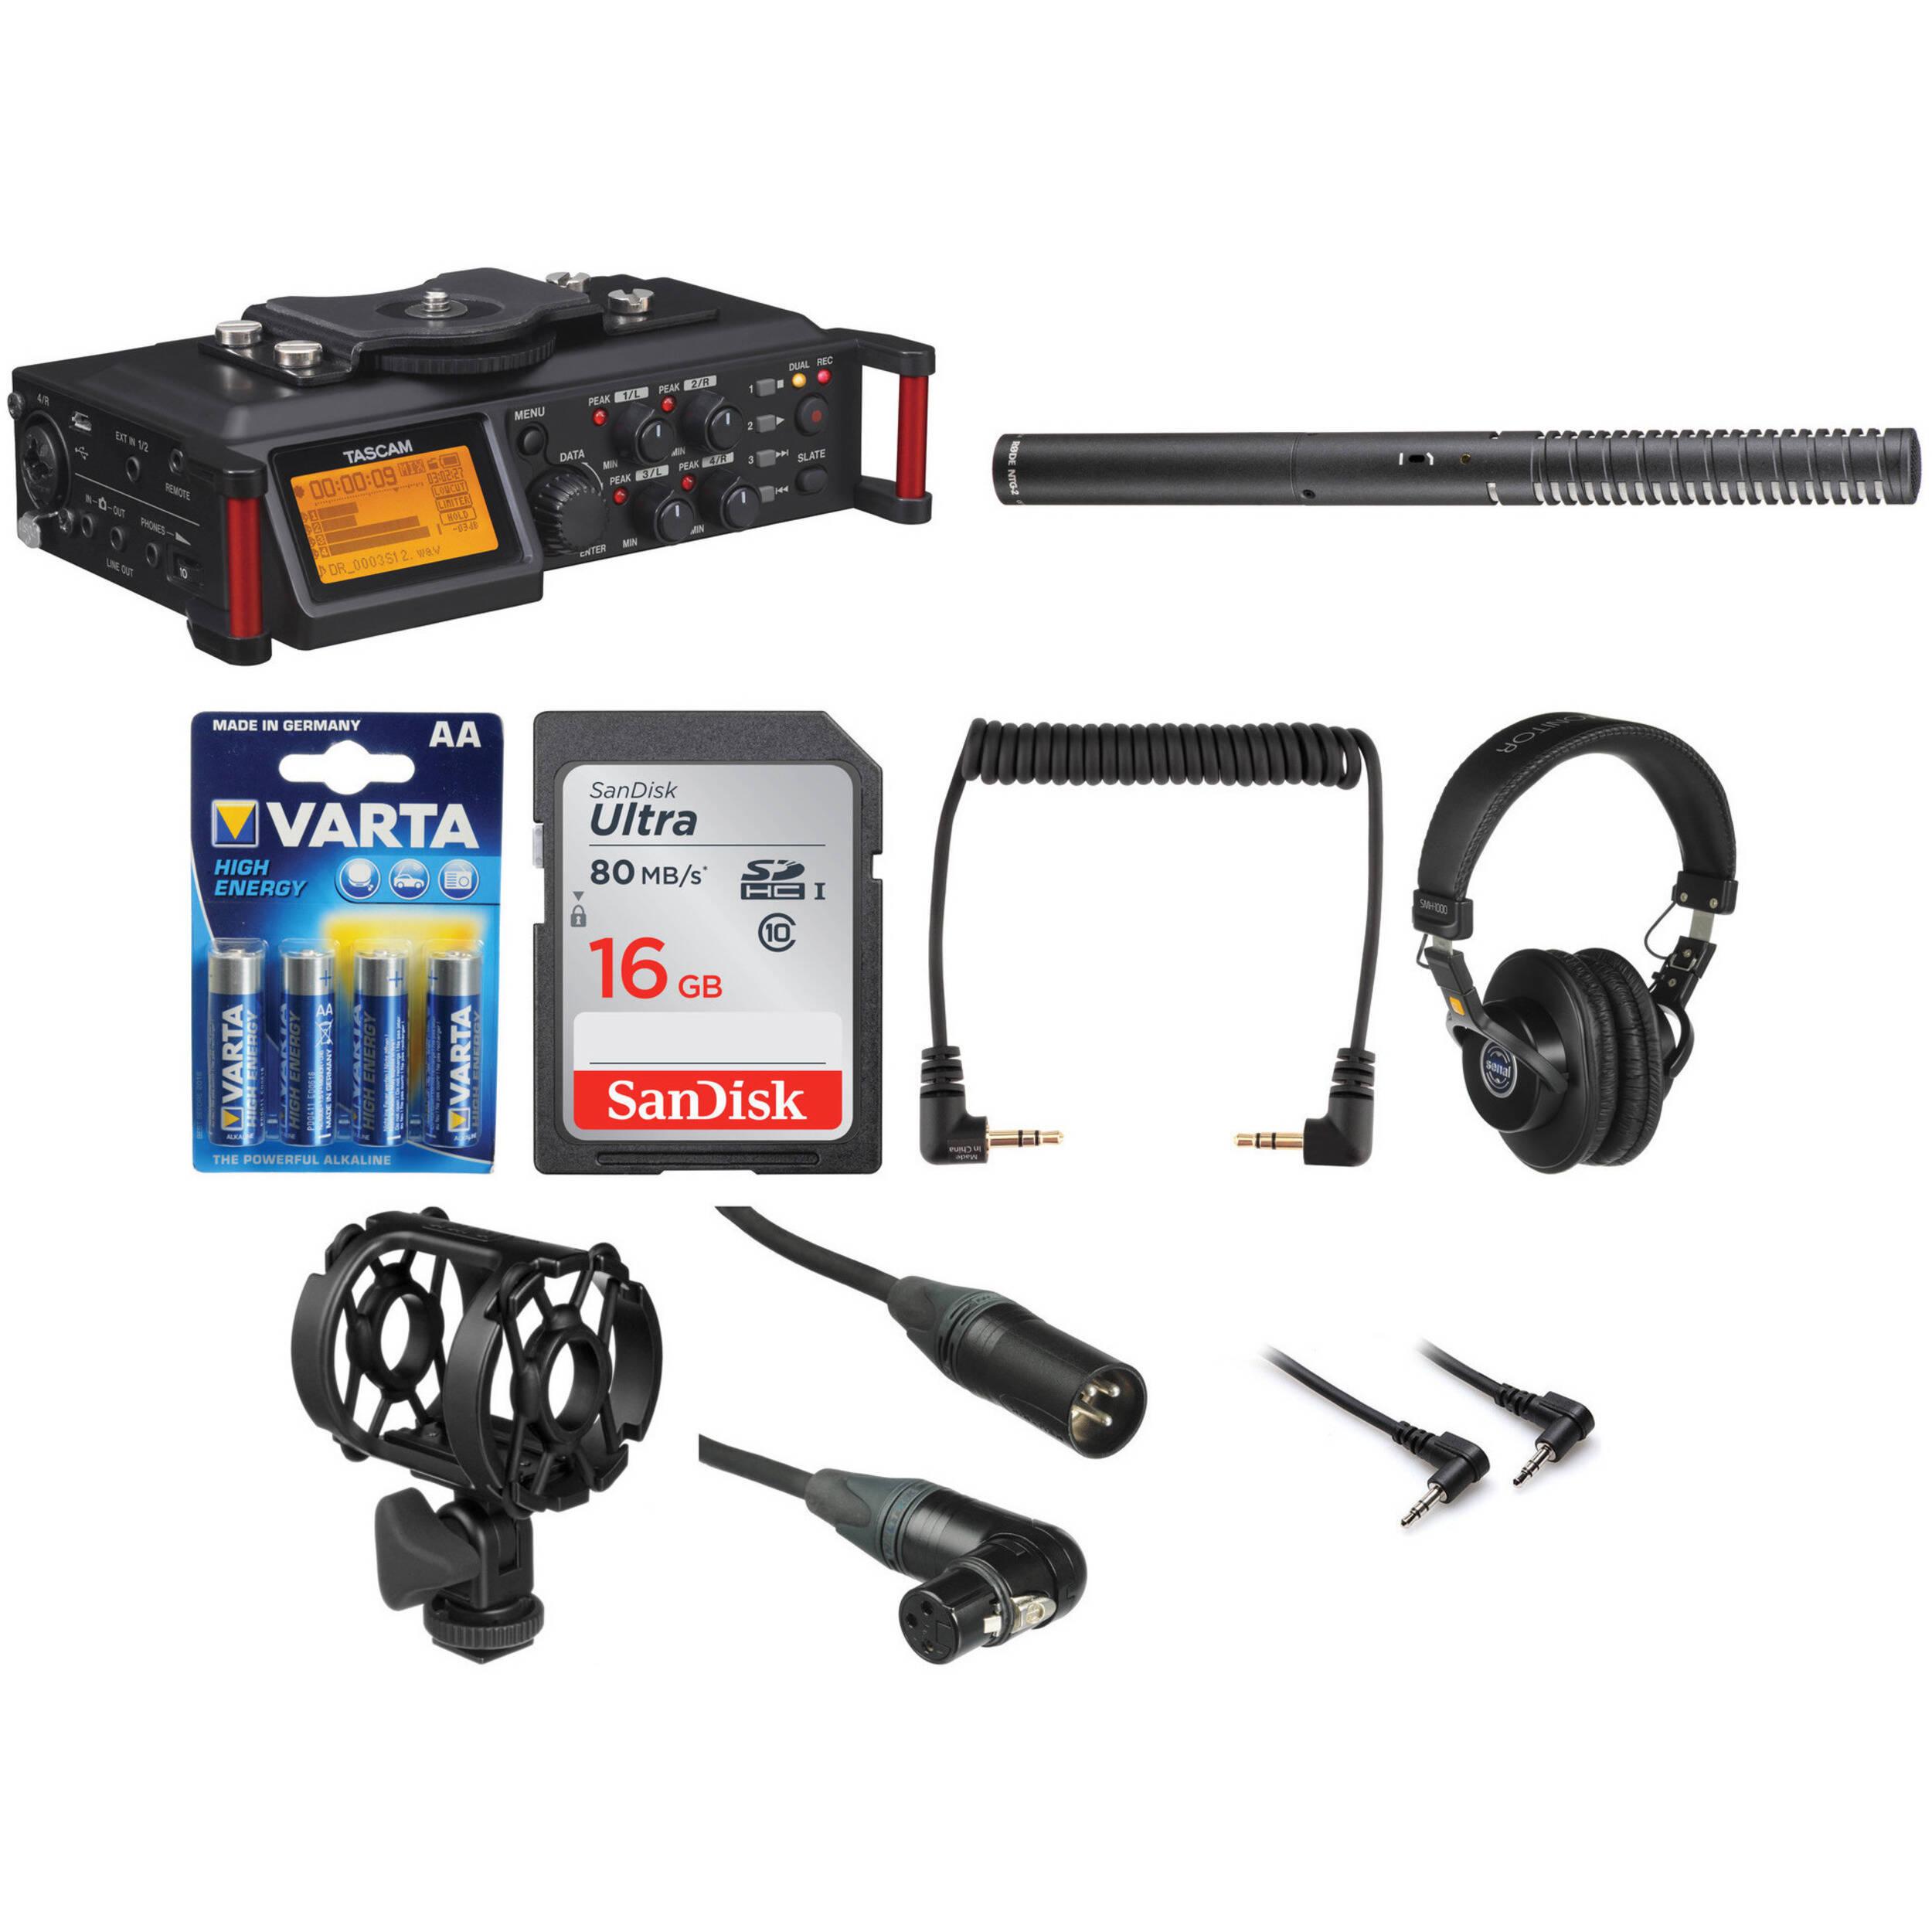 Tascam Dr 70d Recorder Filmmaker Kit Bh Photo Video Mdisk Headset Super Boom J278